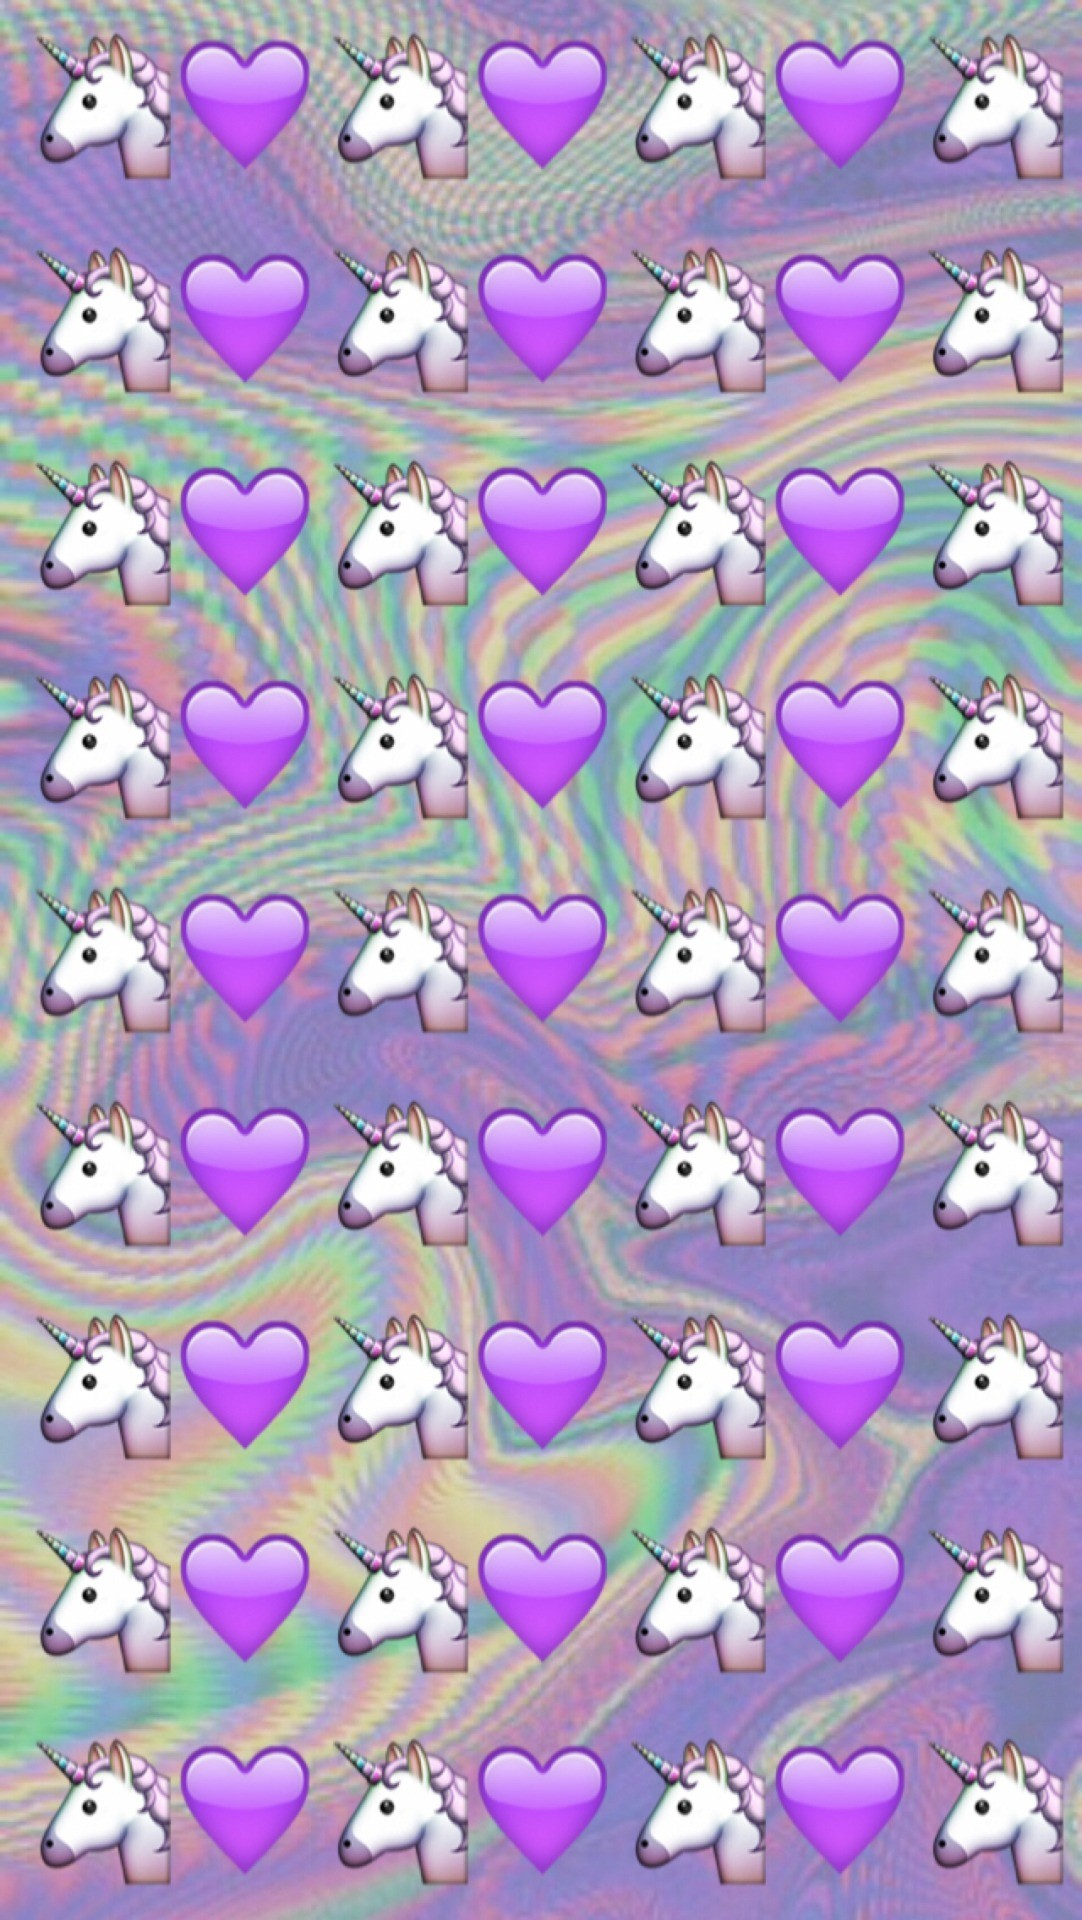 Computer Lock Screen Wallpapers Girls Emoji Wallpapers Girly 61 Images